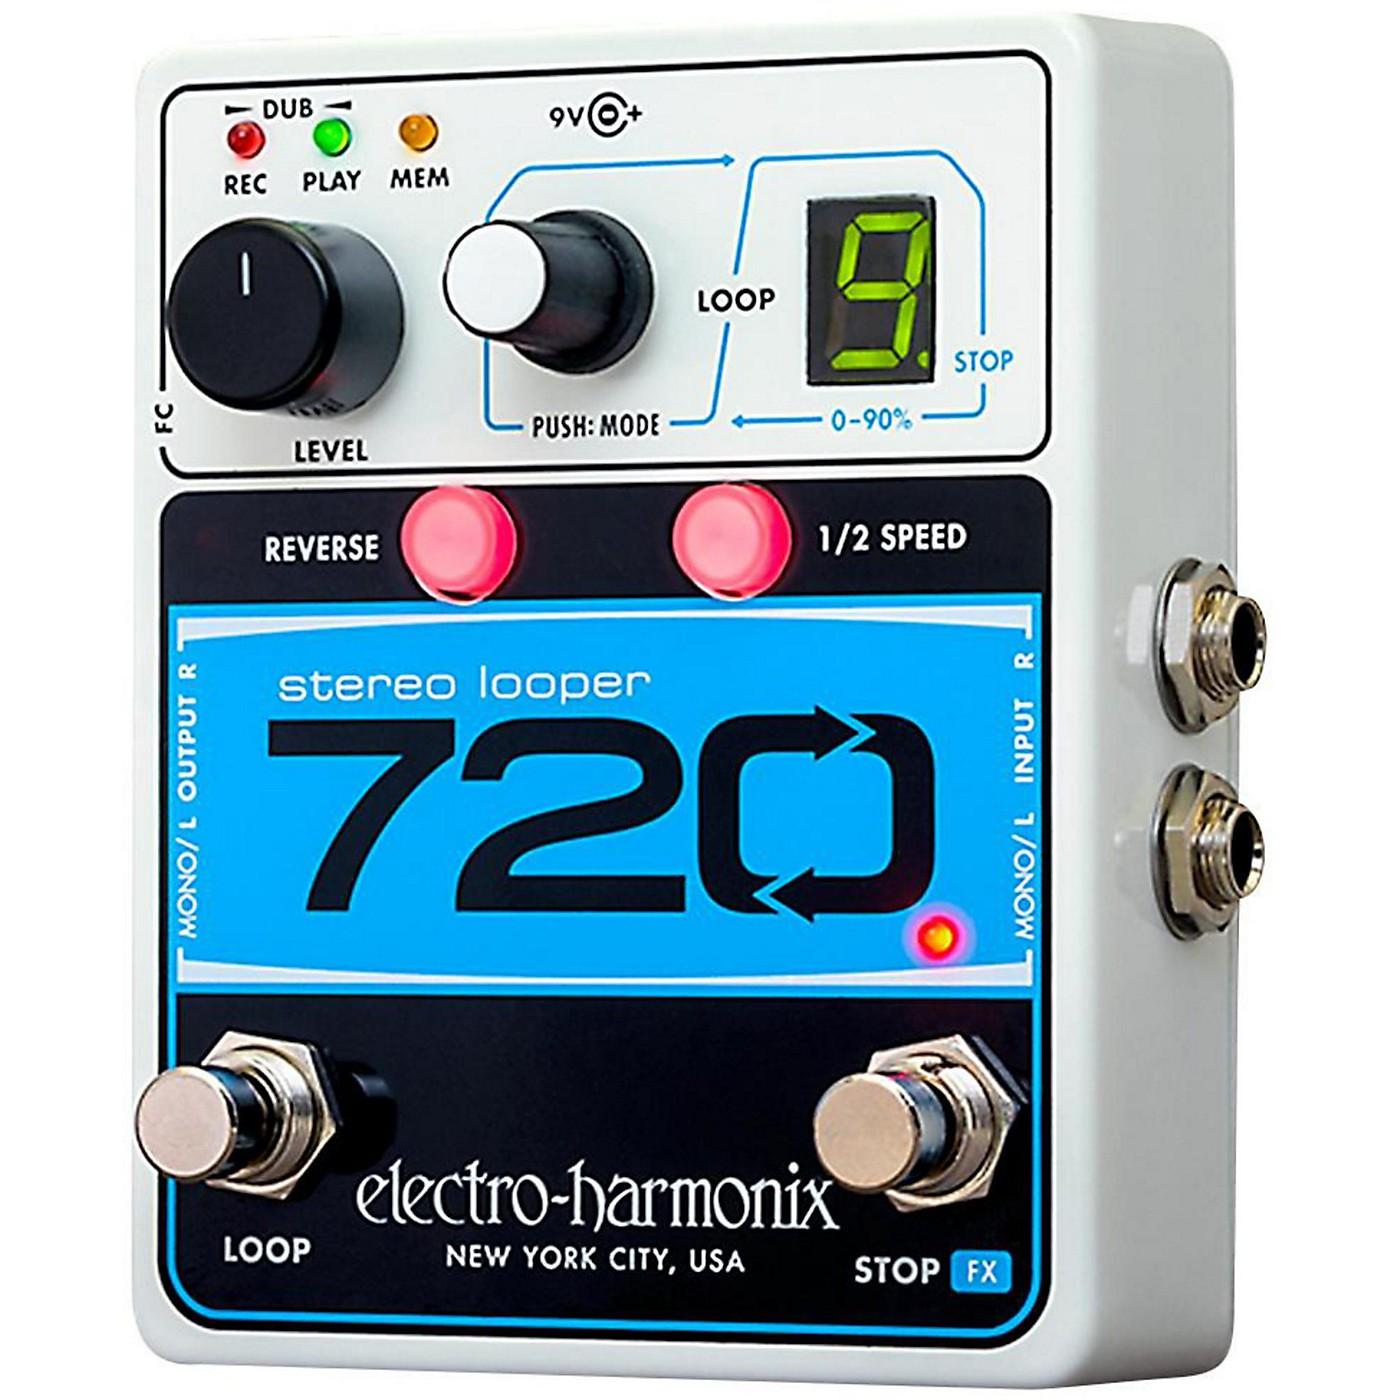 Electro-Harmonix 720 Stereo Looper Pedal thumbnail